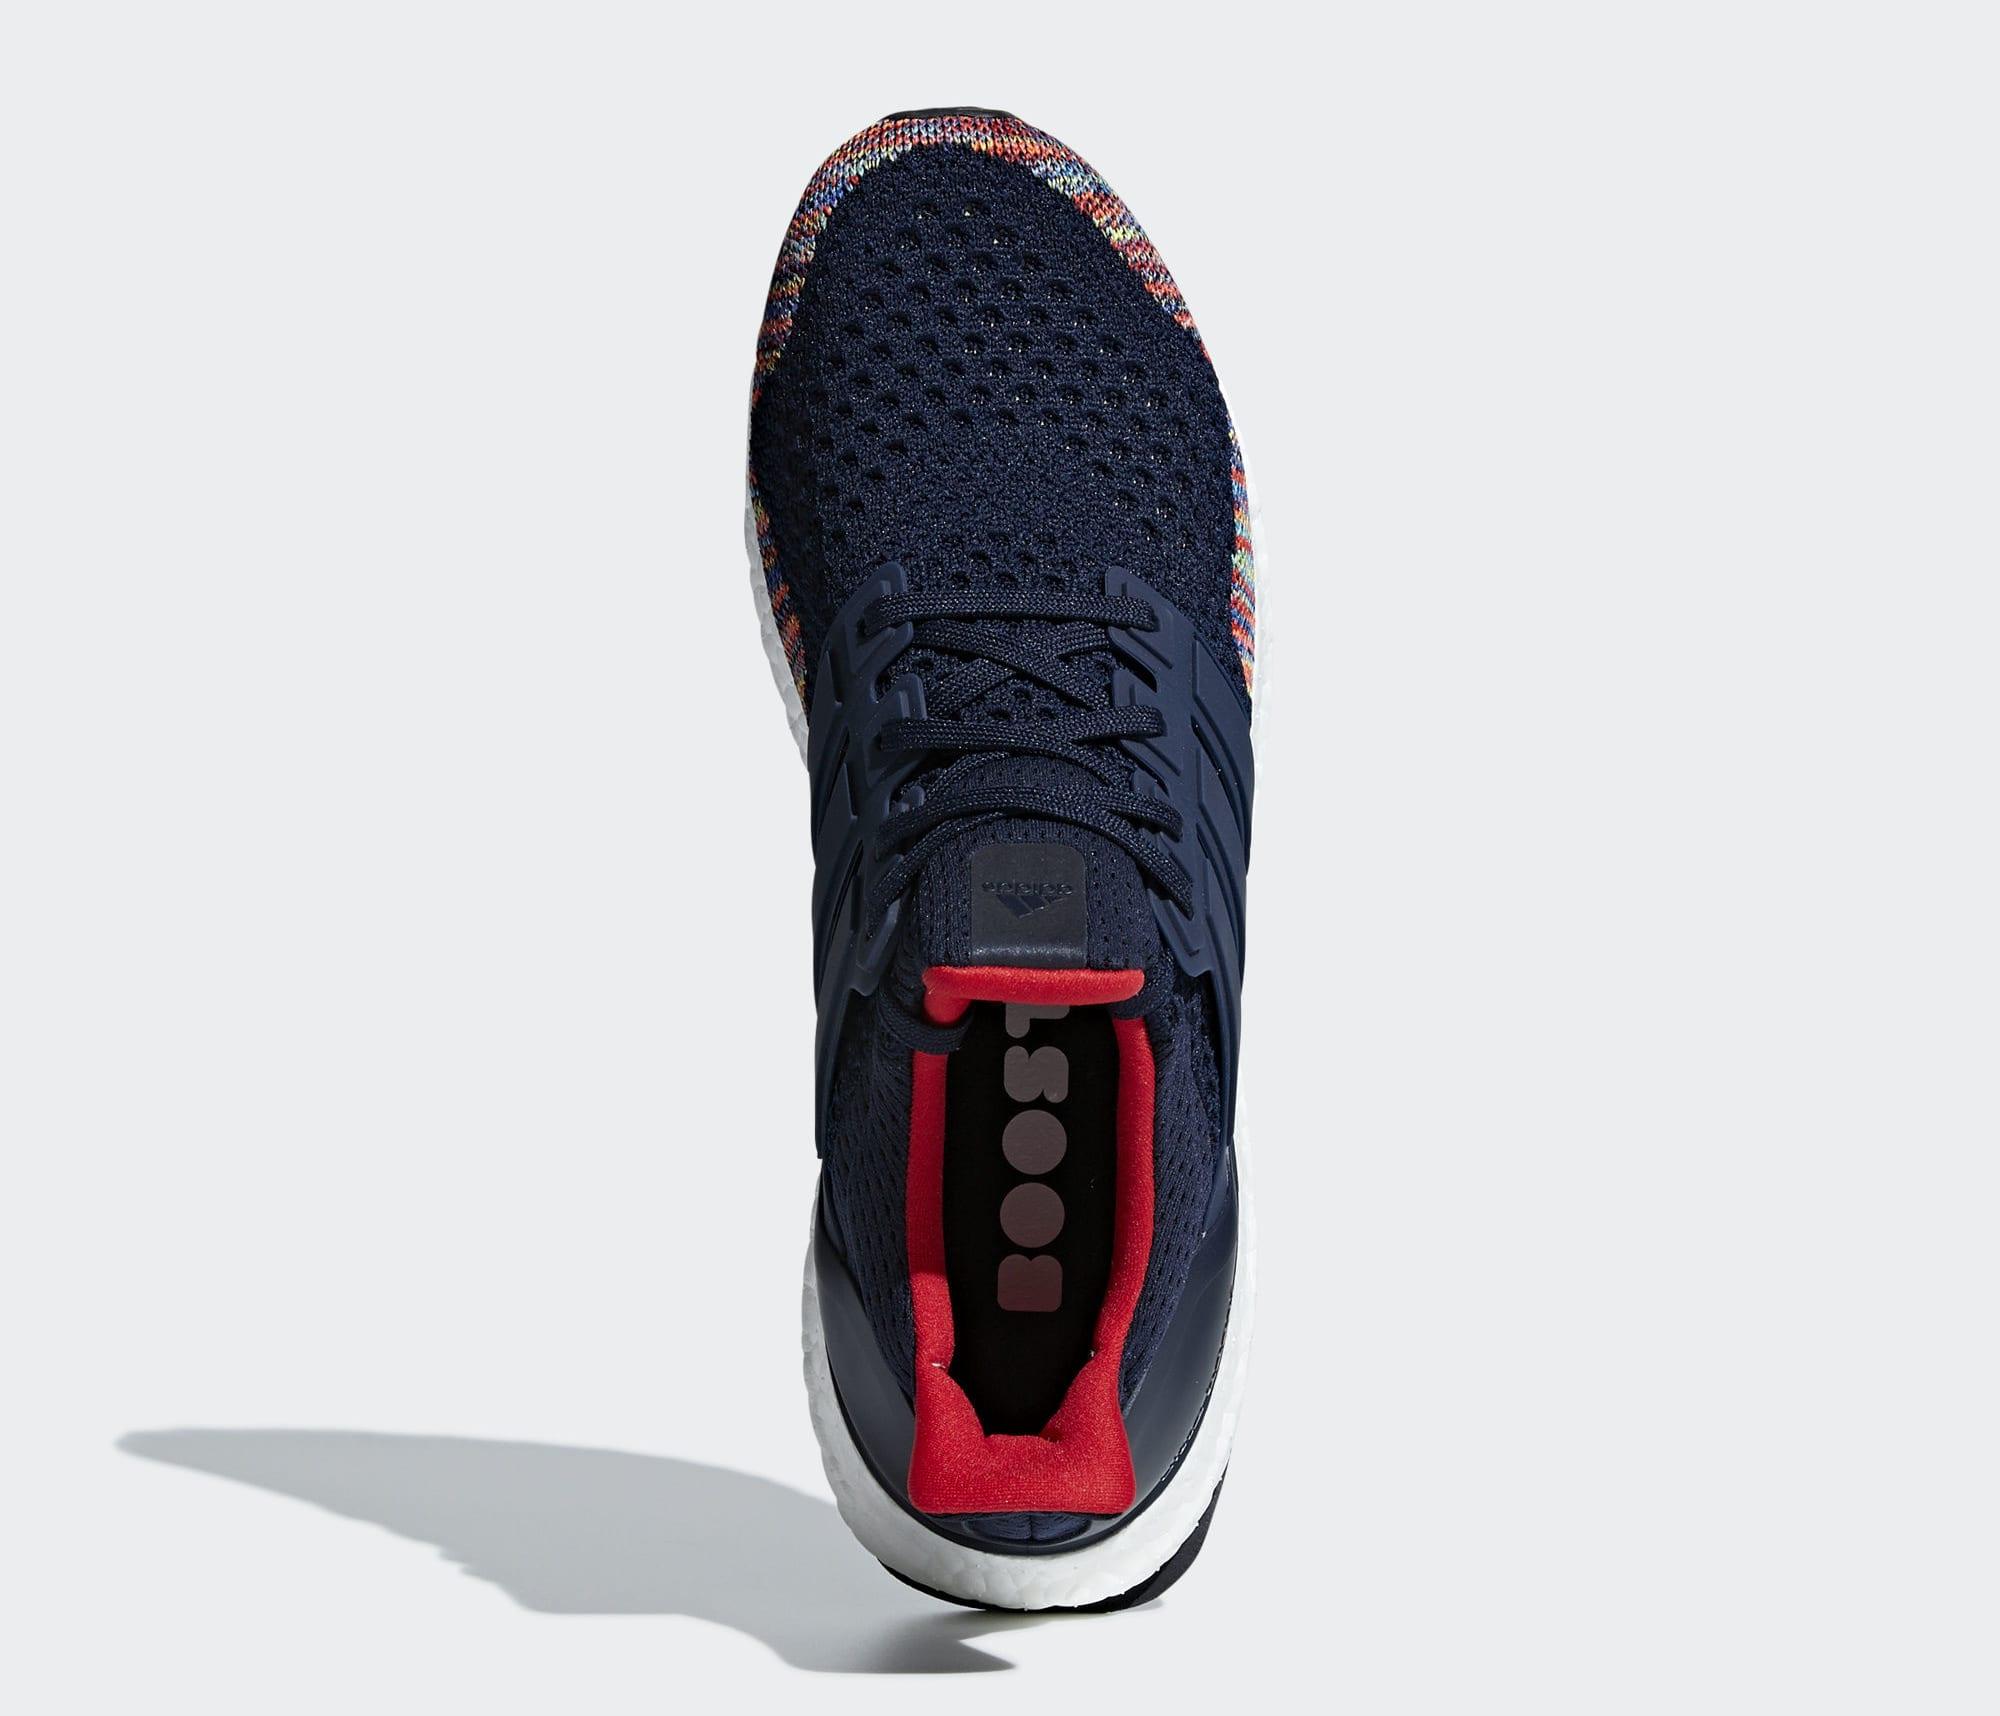 Adidas Ultra Boost 1.0 'Navy Multi' BB7801 (Top)